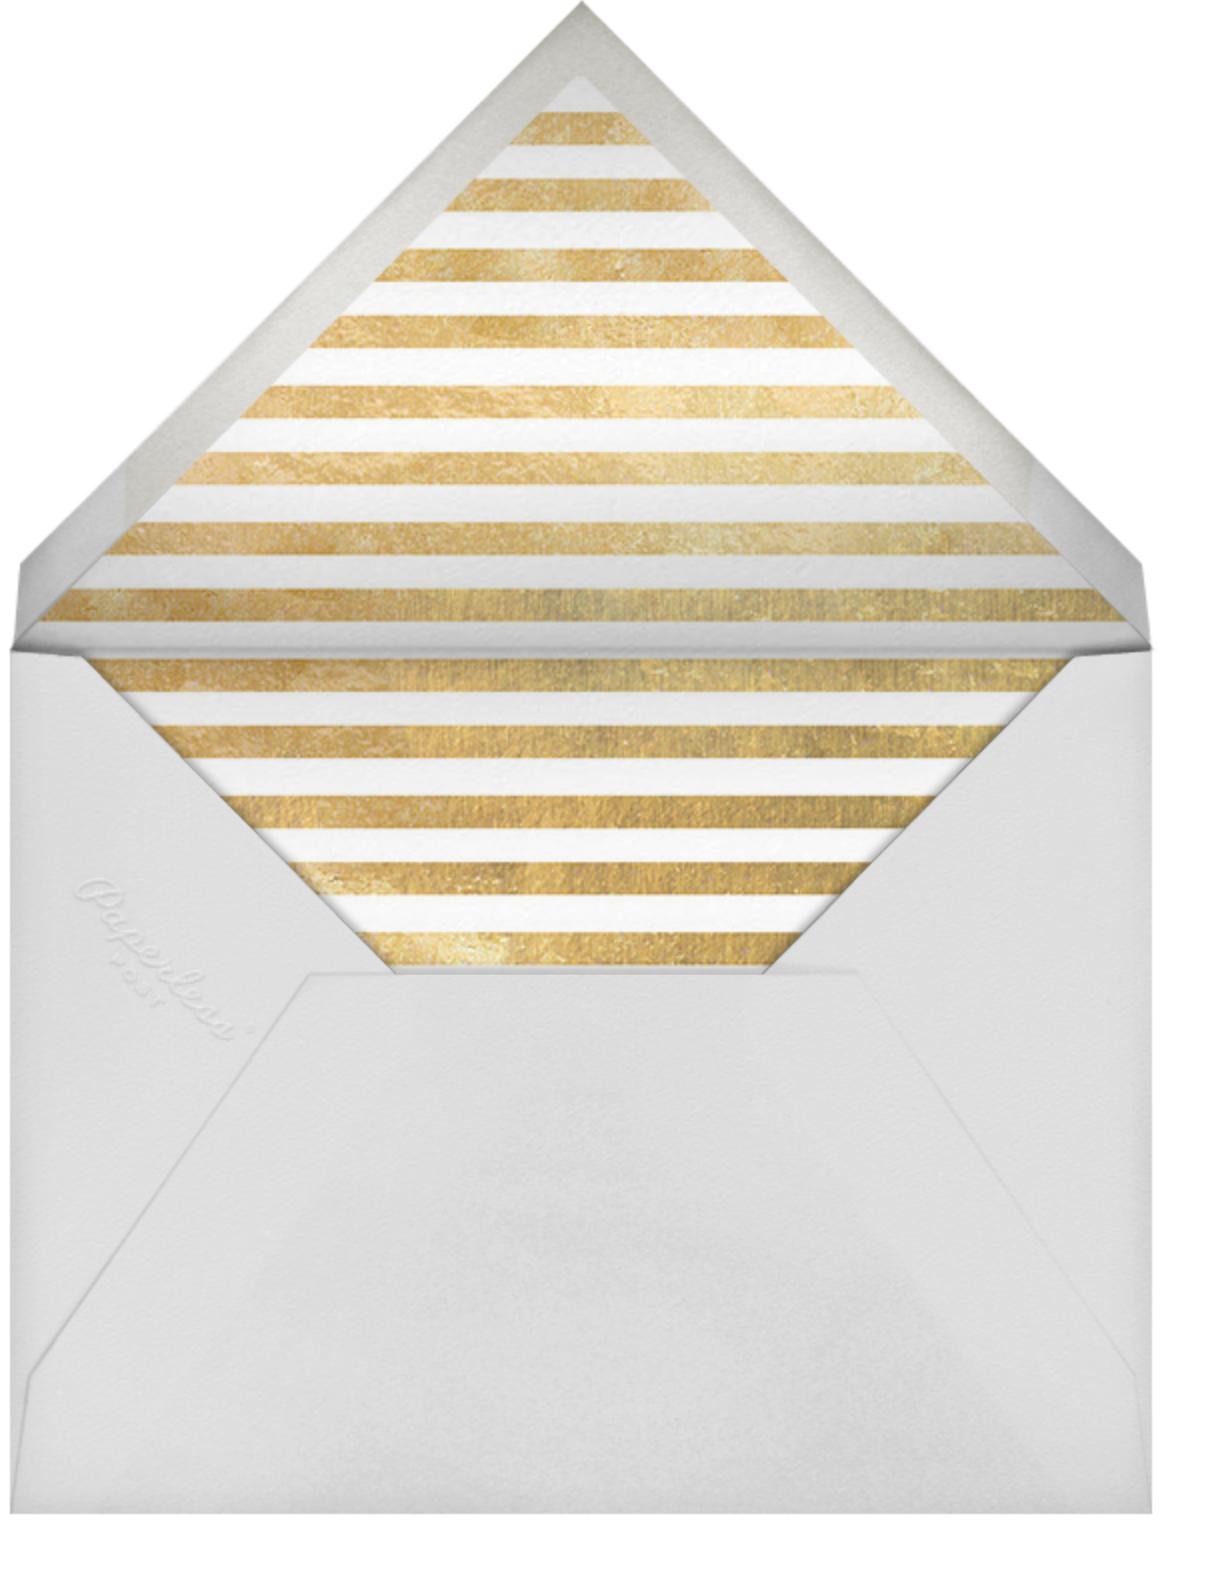 Pop Fizz Clink! (Horizontal) - kate spade new york - Engagement party - envelope back